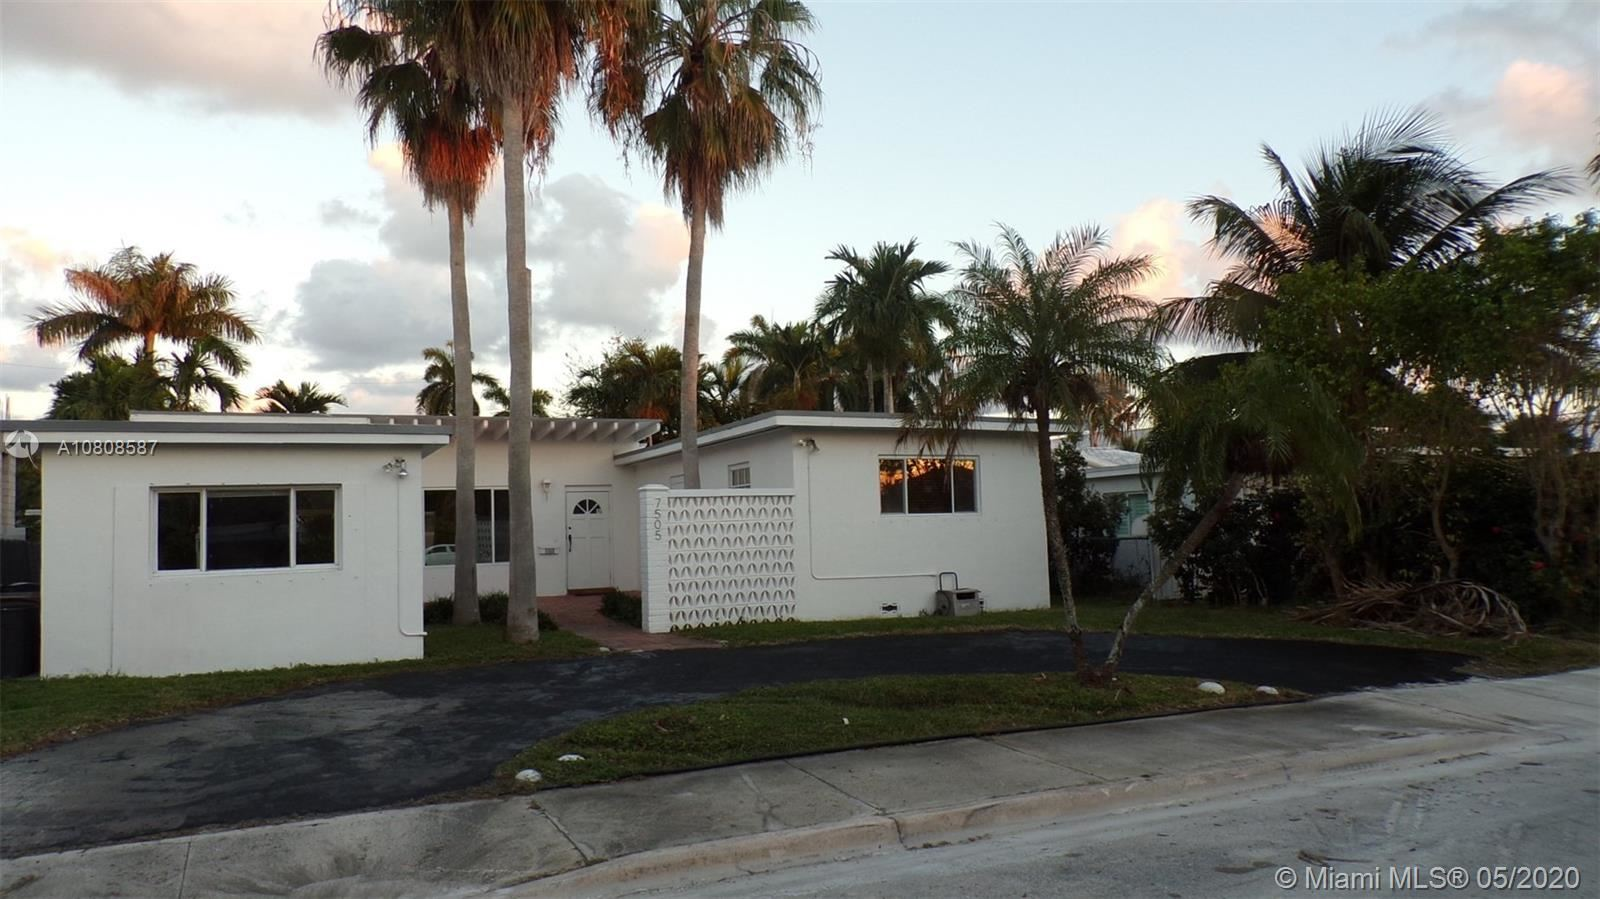 7505 Adventure Ave, North Bay Village, FL 33141 - #: A10808587